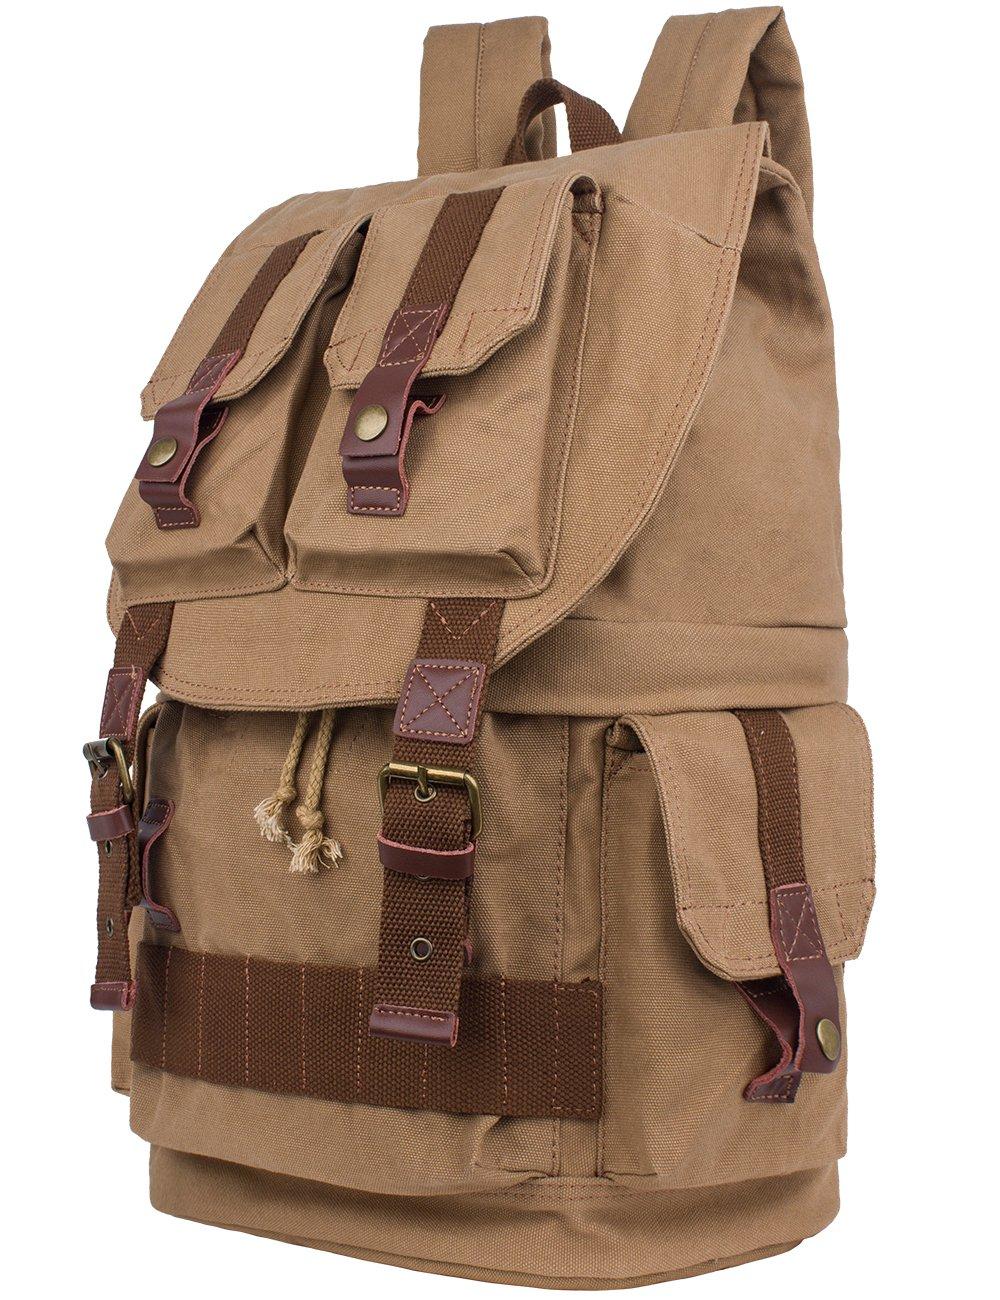 Leaper Large Canvas DSLR SLR Camera Backpack Rucksack Bag for Sony Canon Nikon Olympus (Khaki)